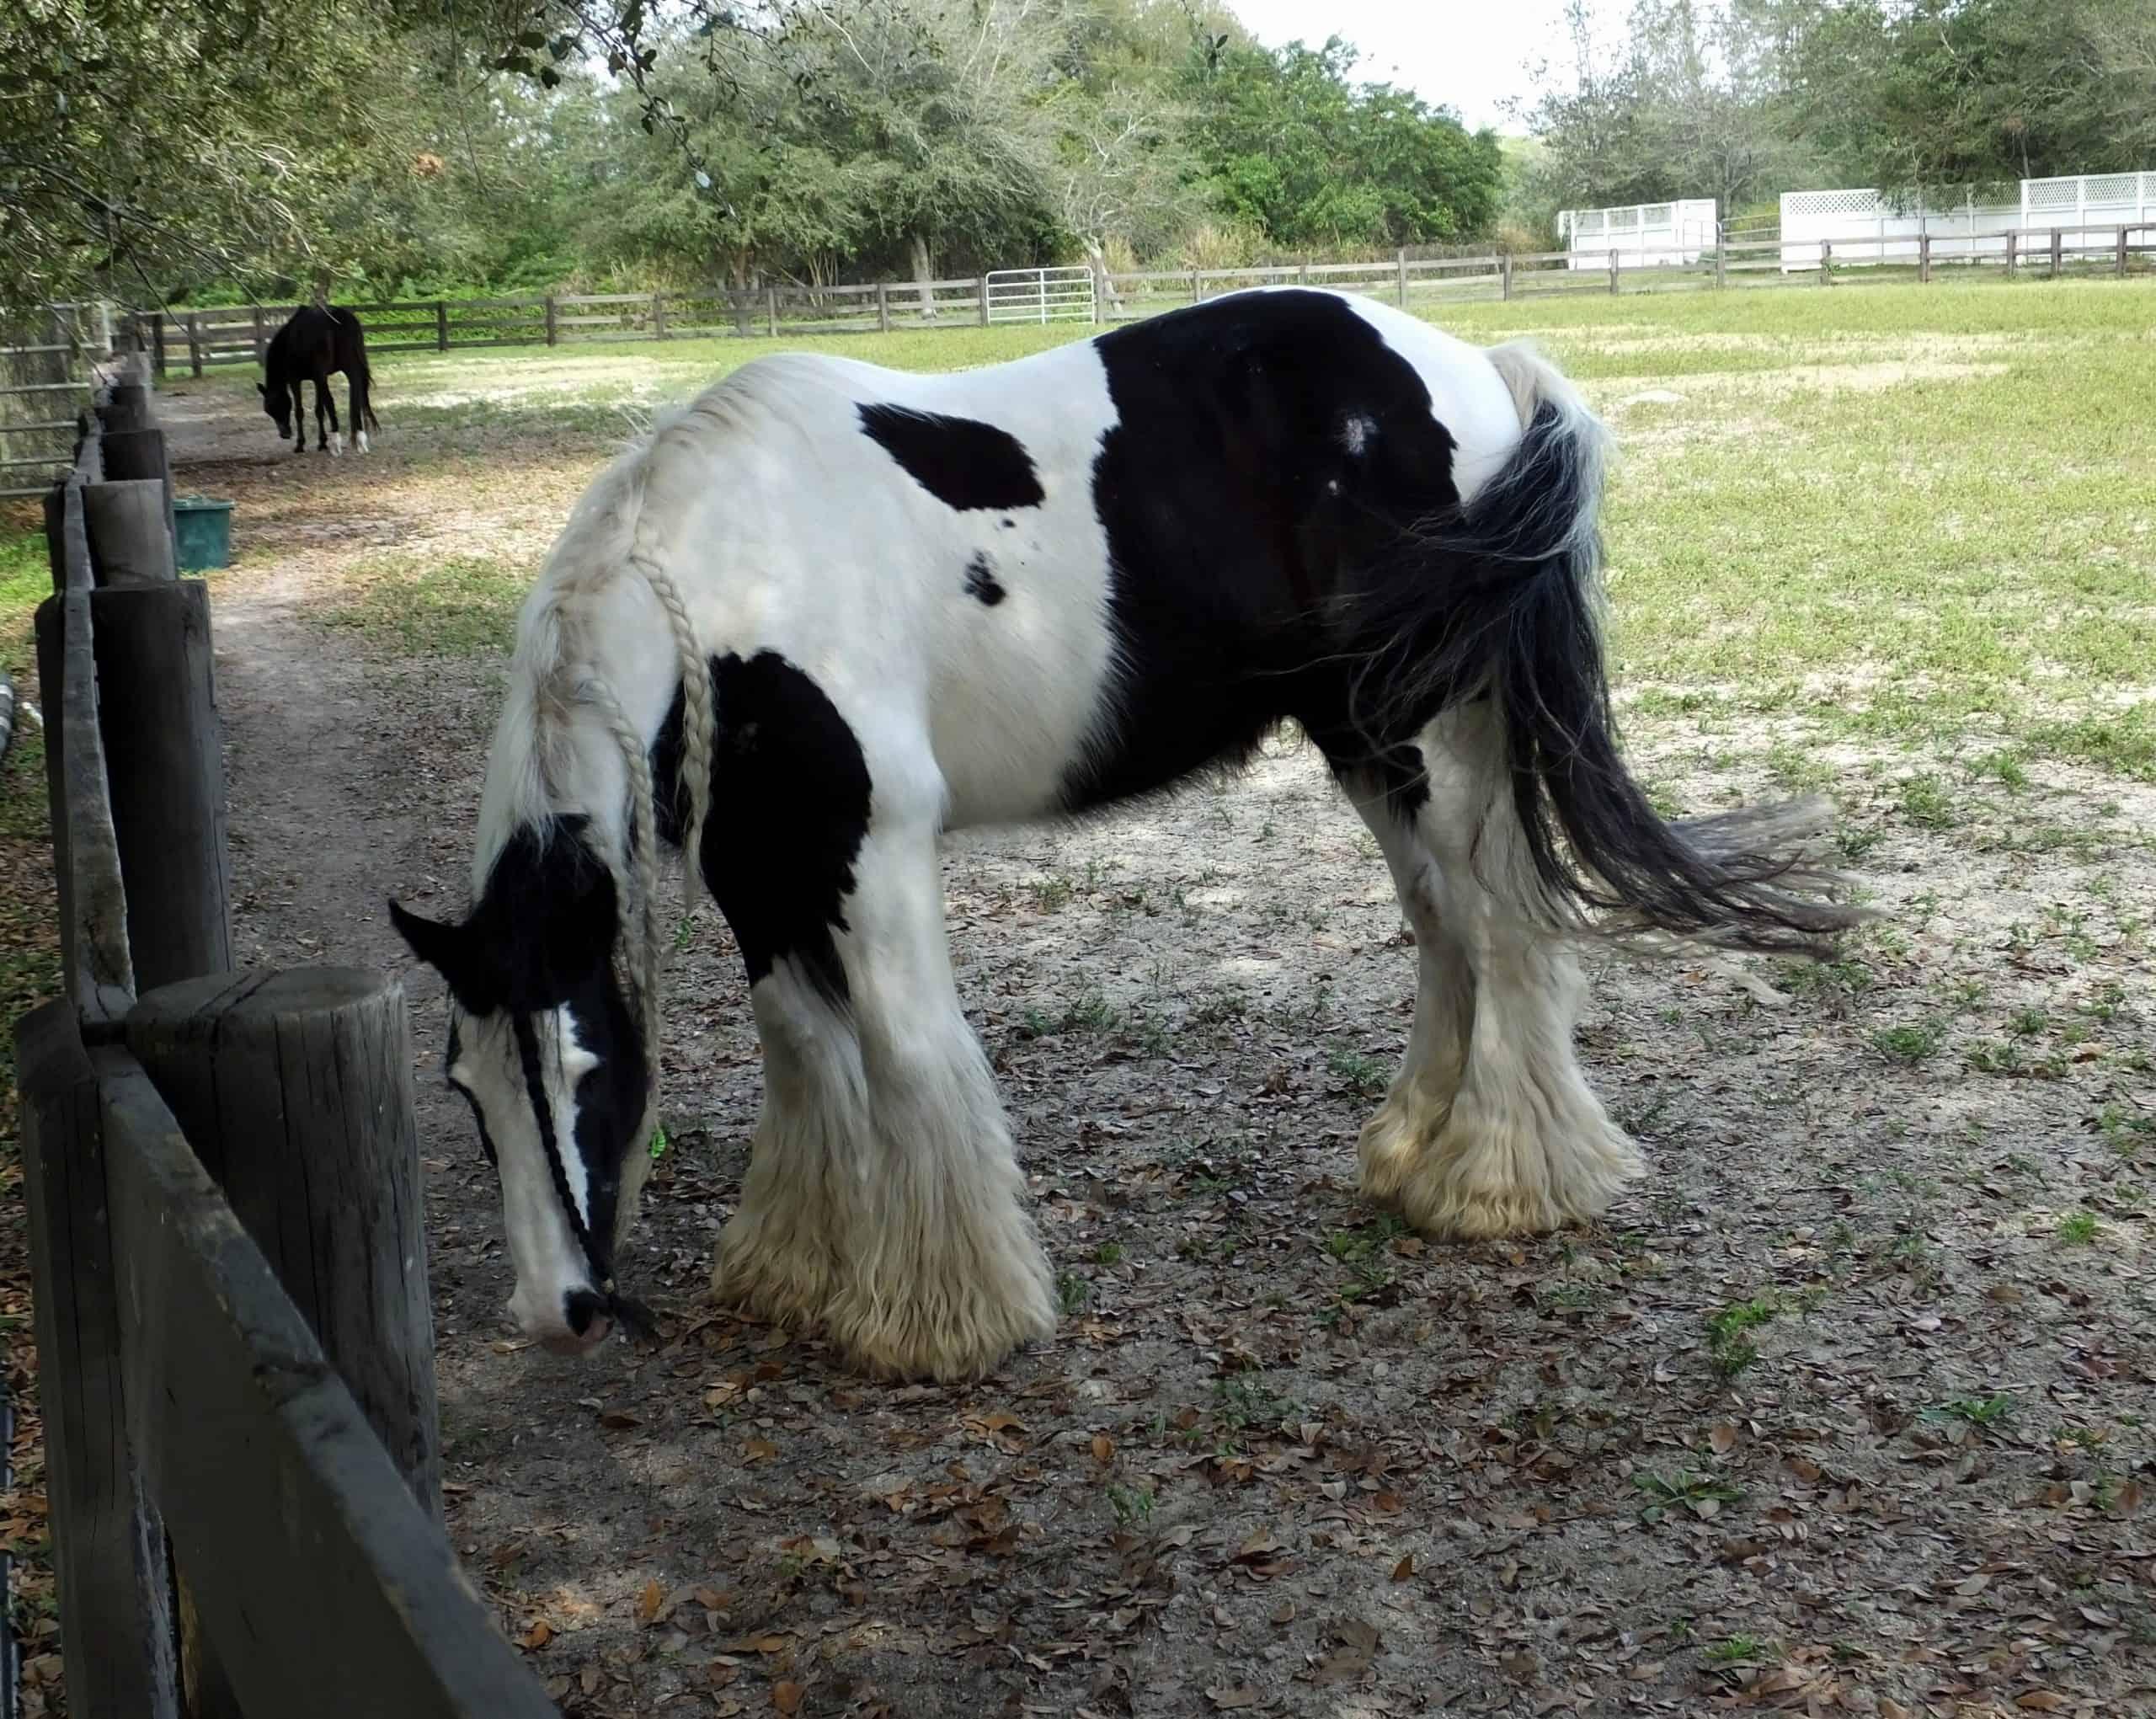 irish horse breeds Gypsy Vanner horse with a braided mane.